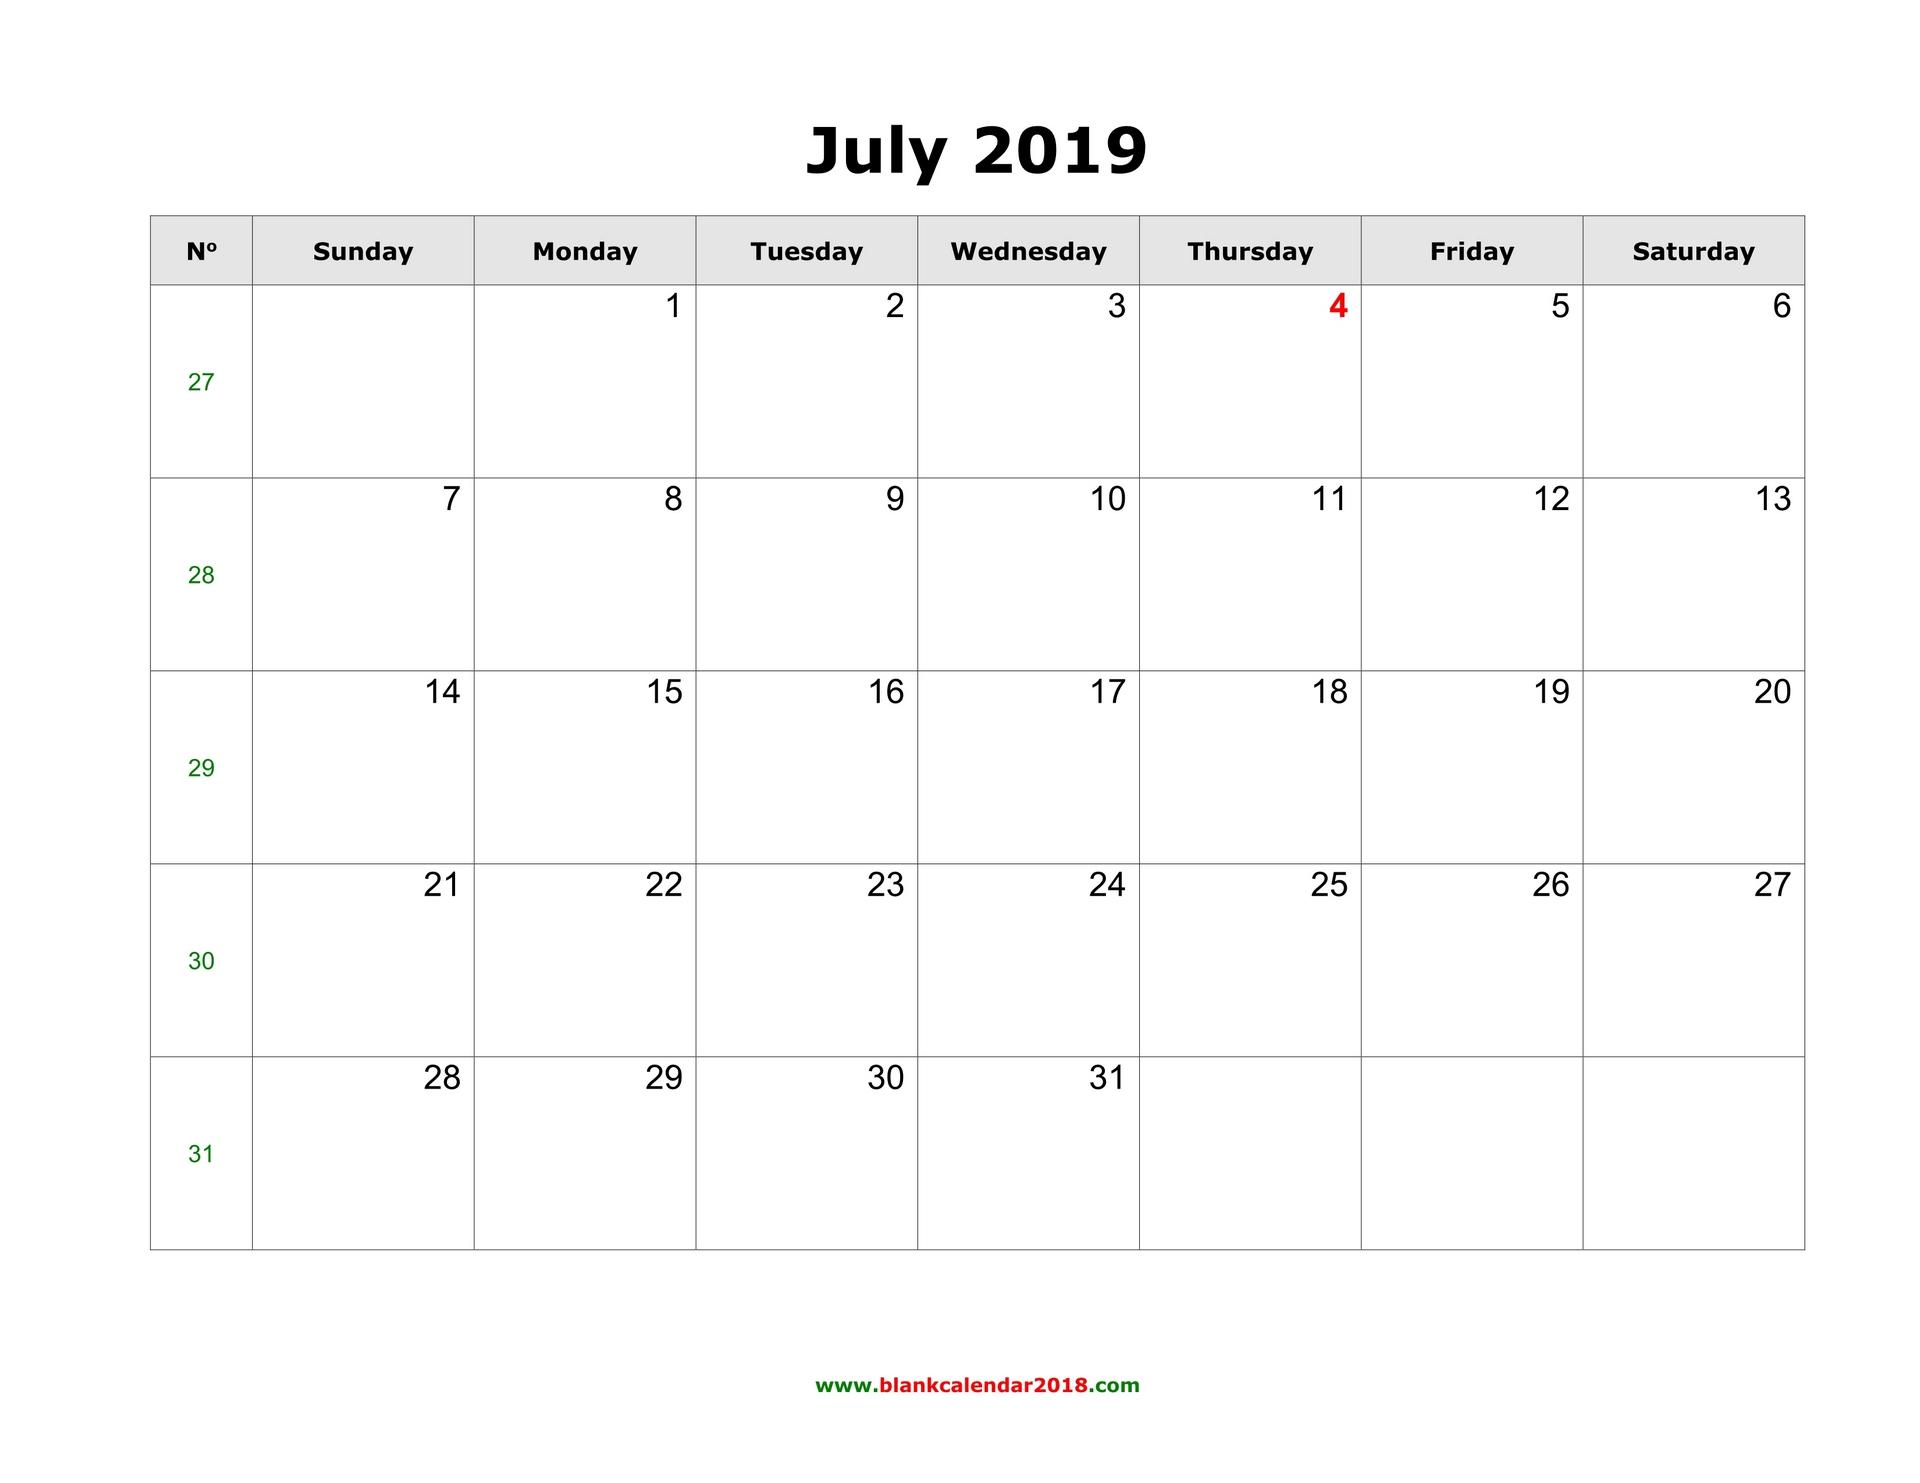 Blank Calendar For July 2019 pertaining to Blank July Calendar Printable